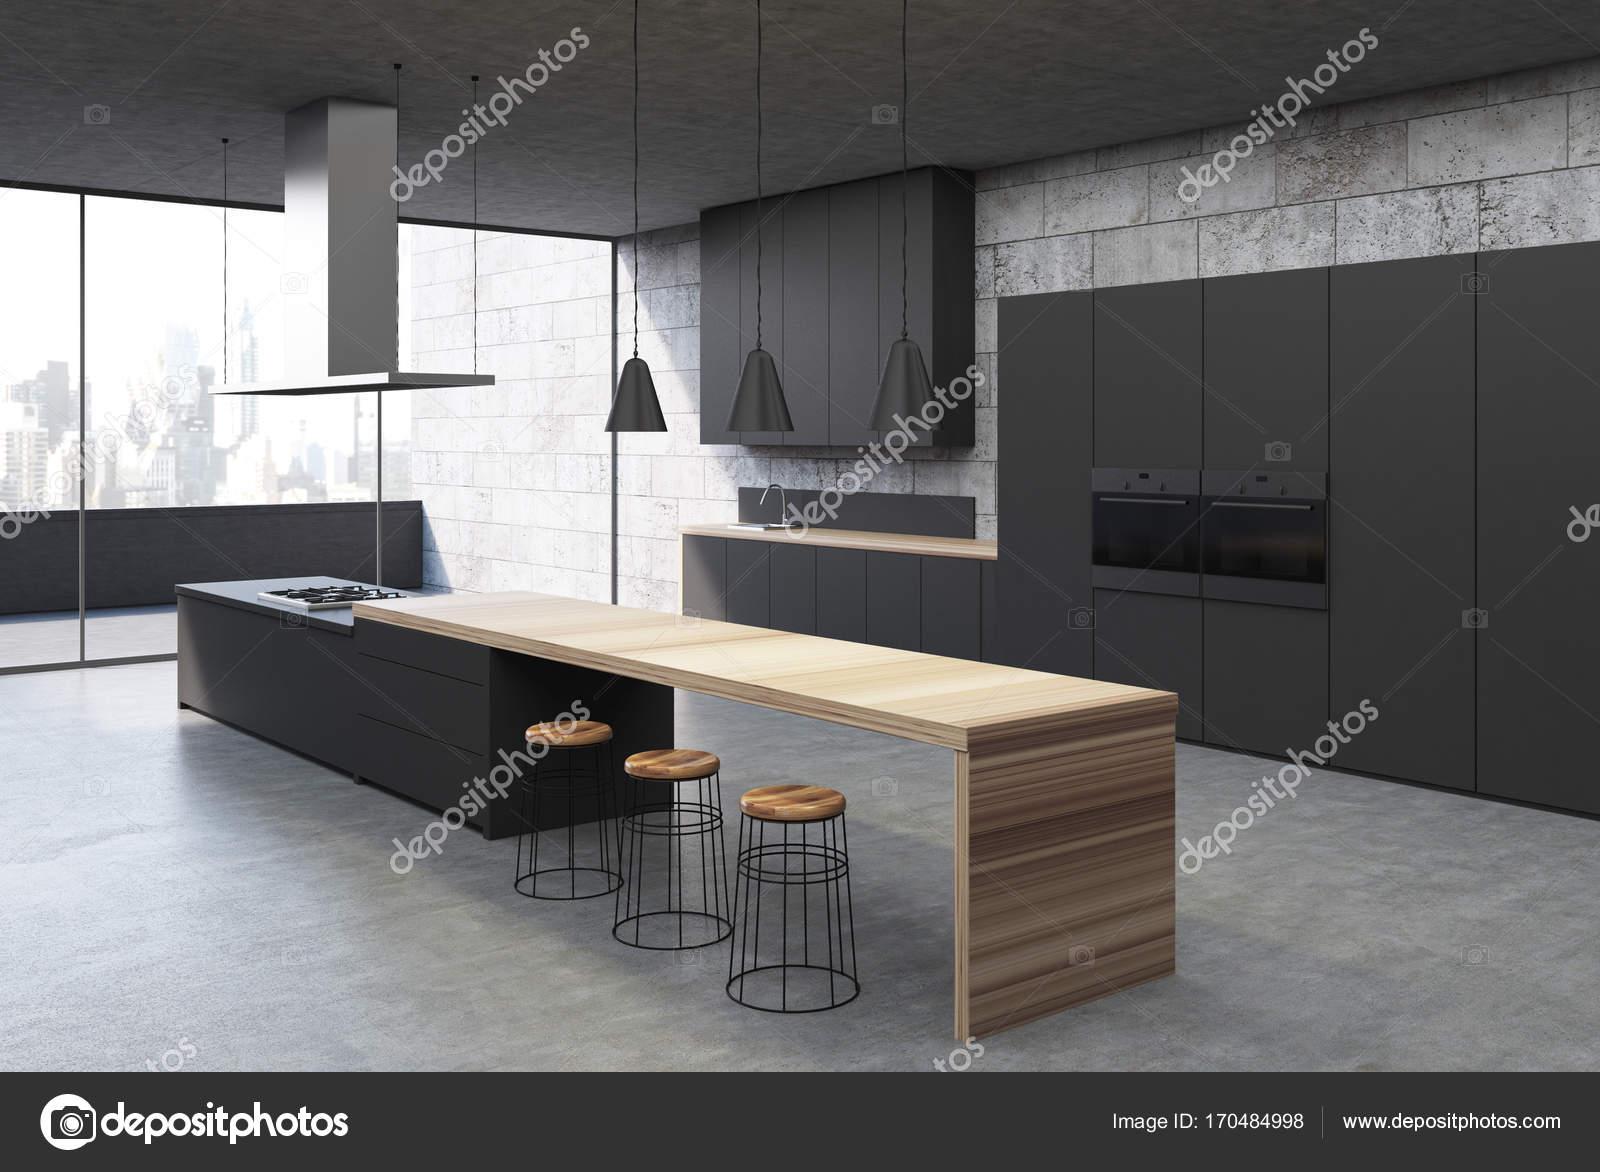 Konkrete Kuchenschranke Innen Schwarz Ecke Stockfoto